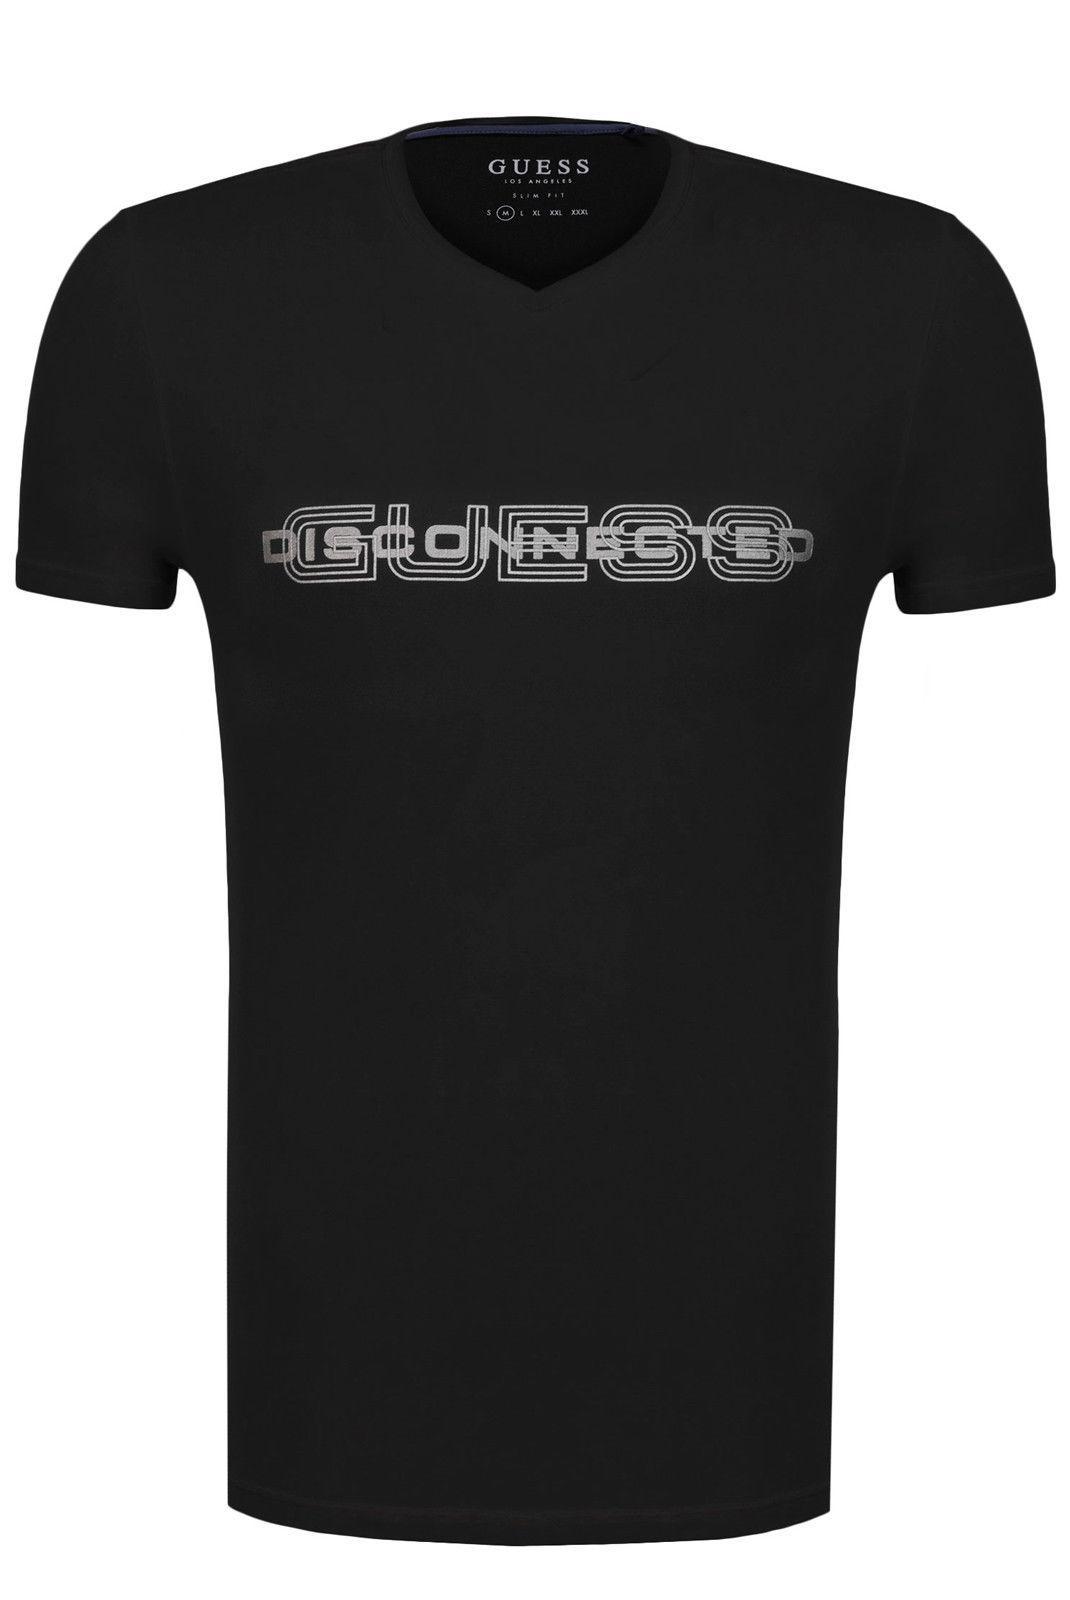 brand new 4f60f e3ba1 GUESS T-SHIRT A MANICHE CORTE M81I45 NERO Men s T-Shirt New Fashion Casual  Cotton Short-Sleeve Funny